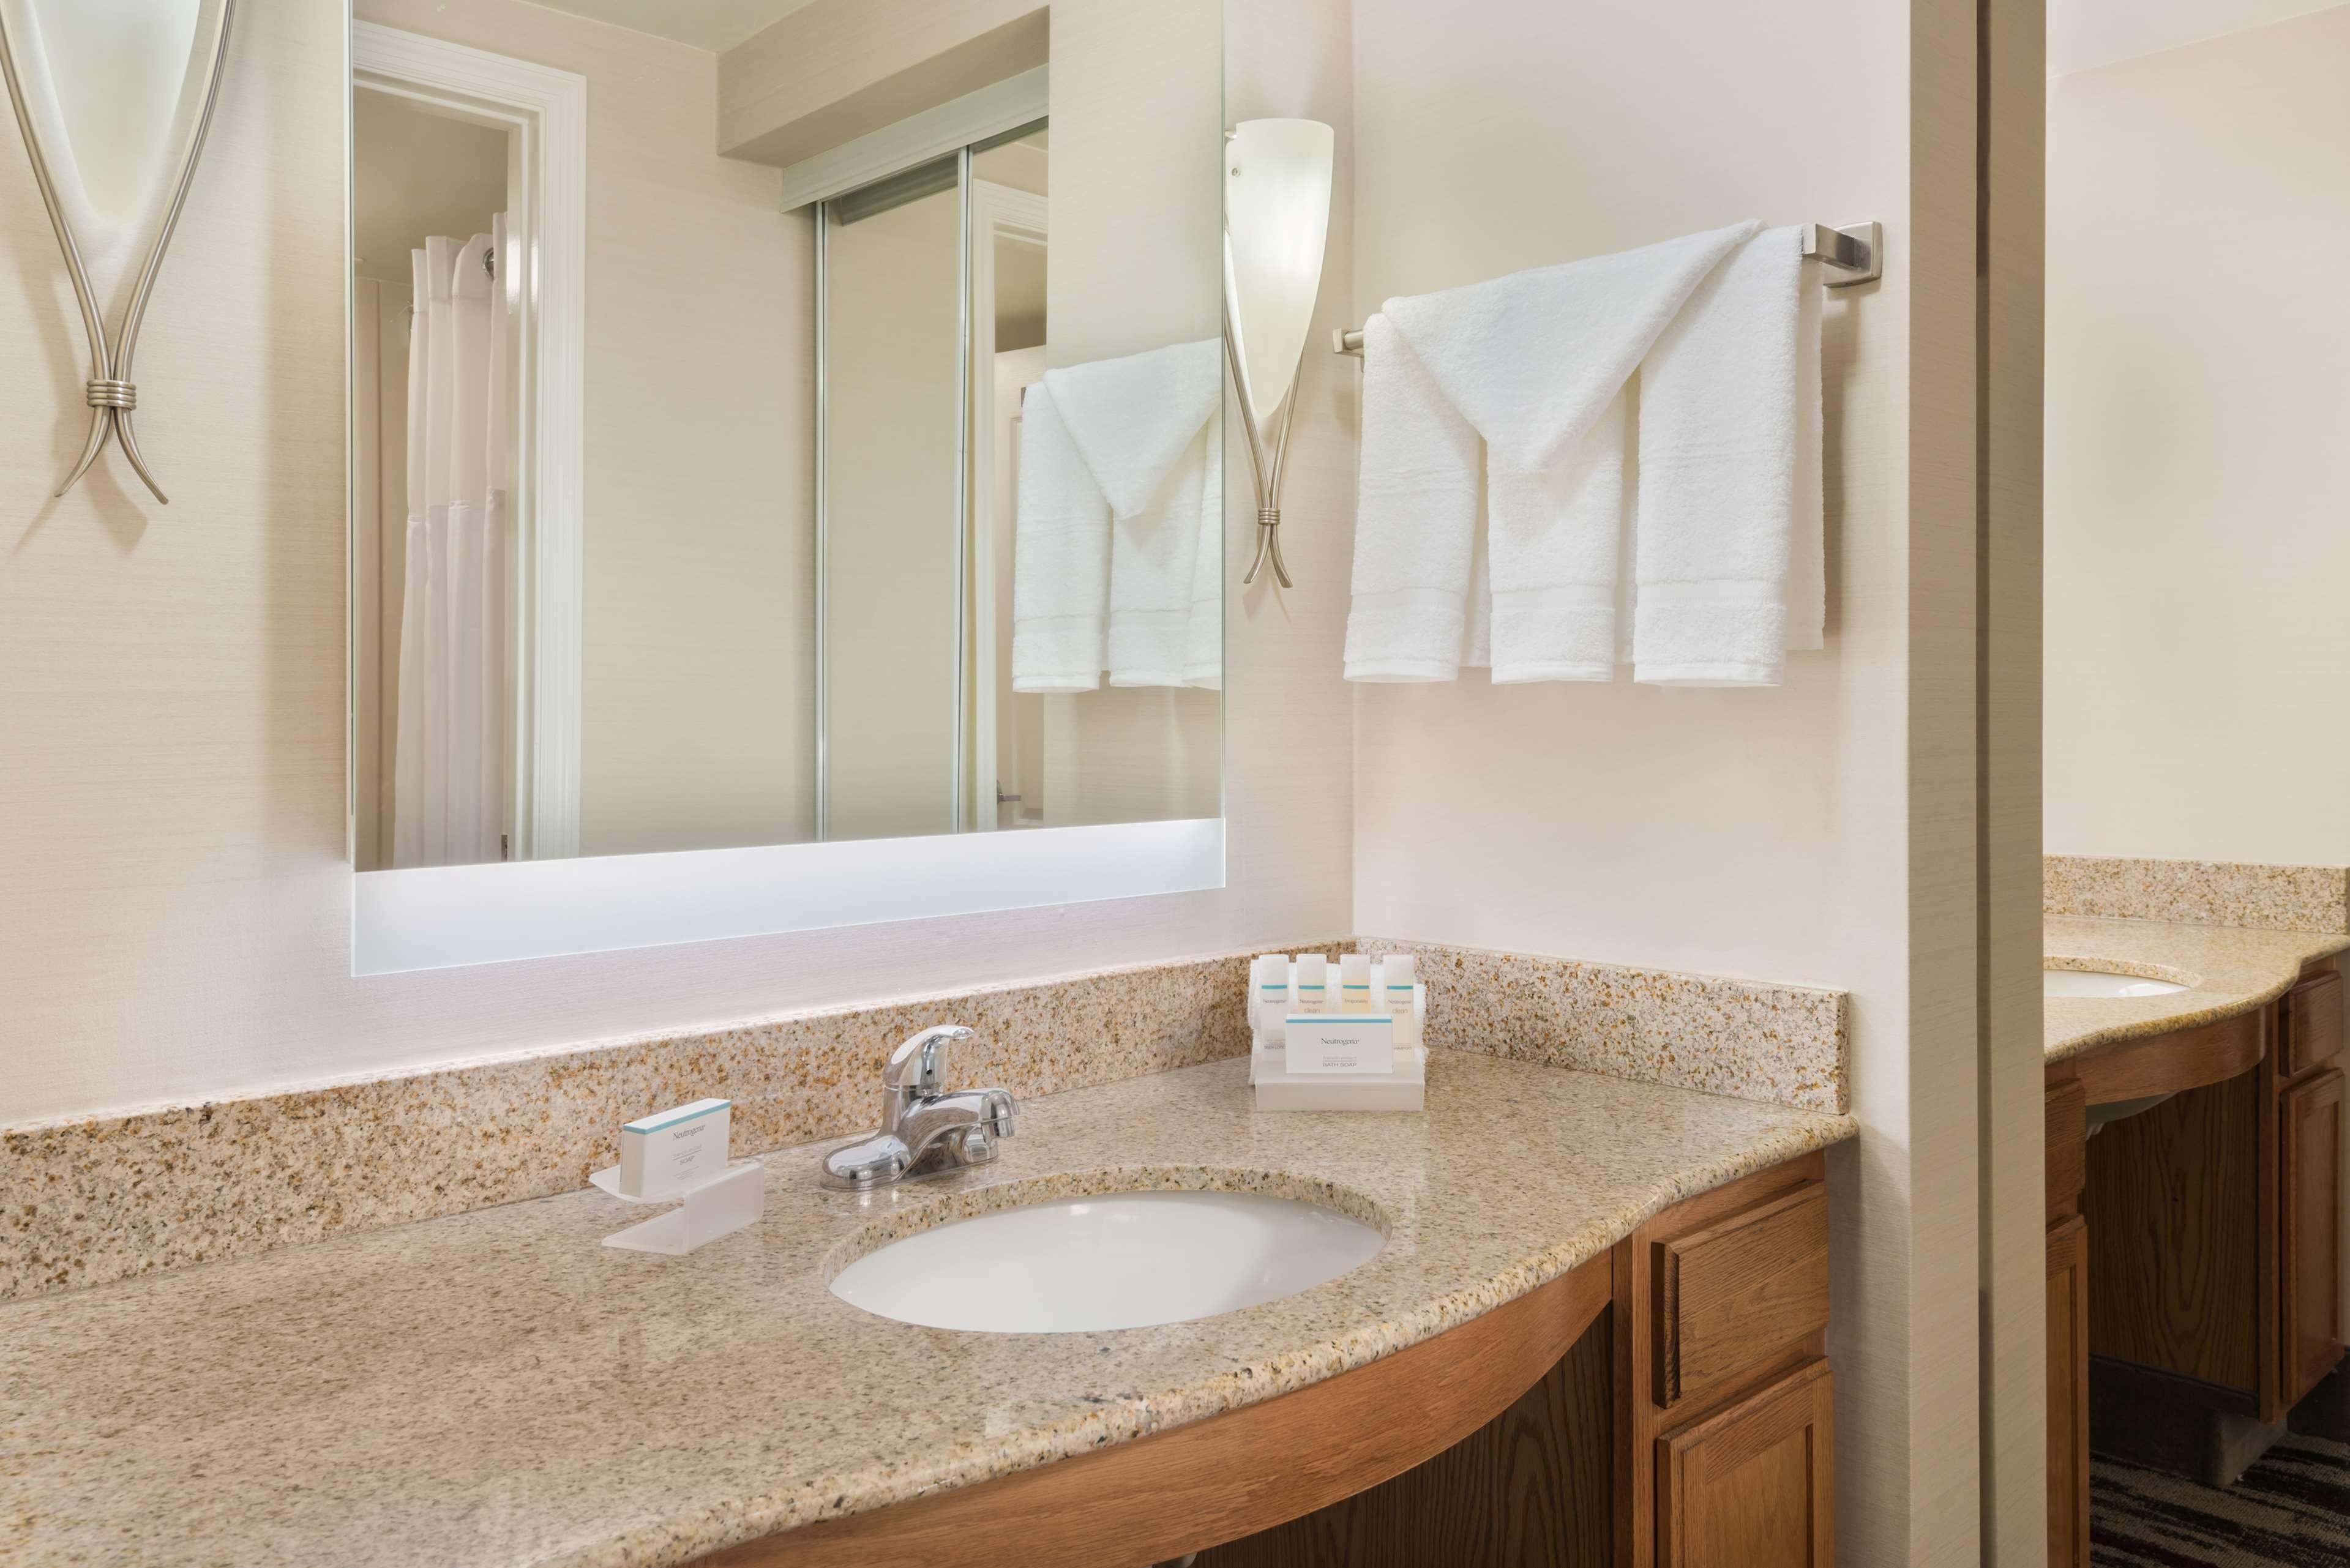 Homewood Suites by Hilton Orlando-UCF Area image 20